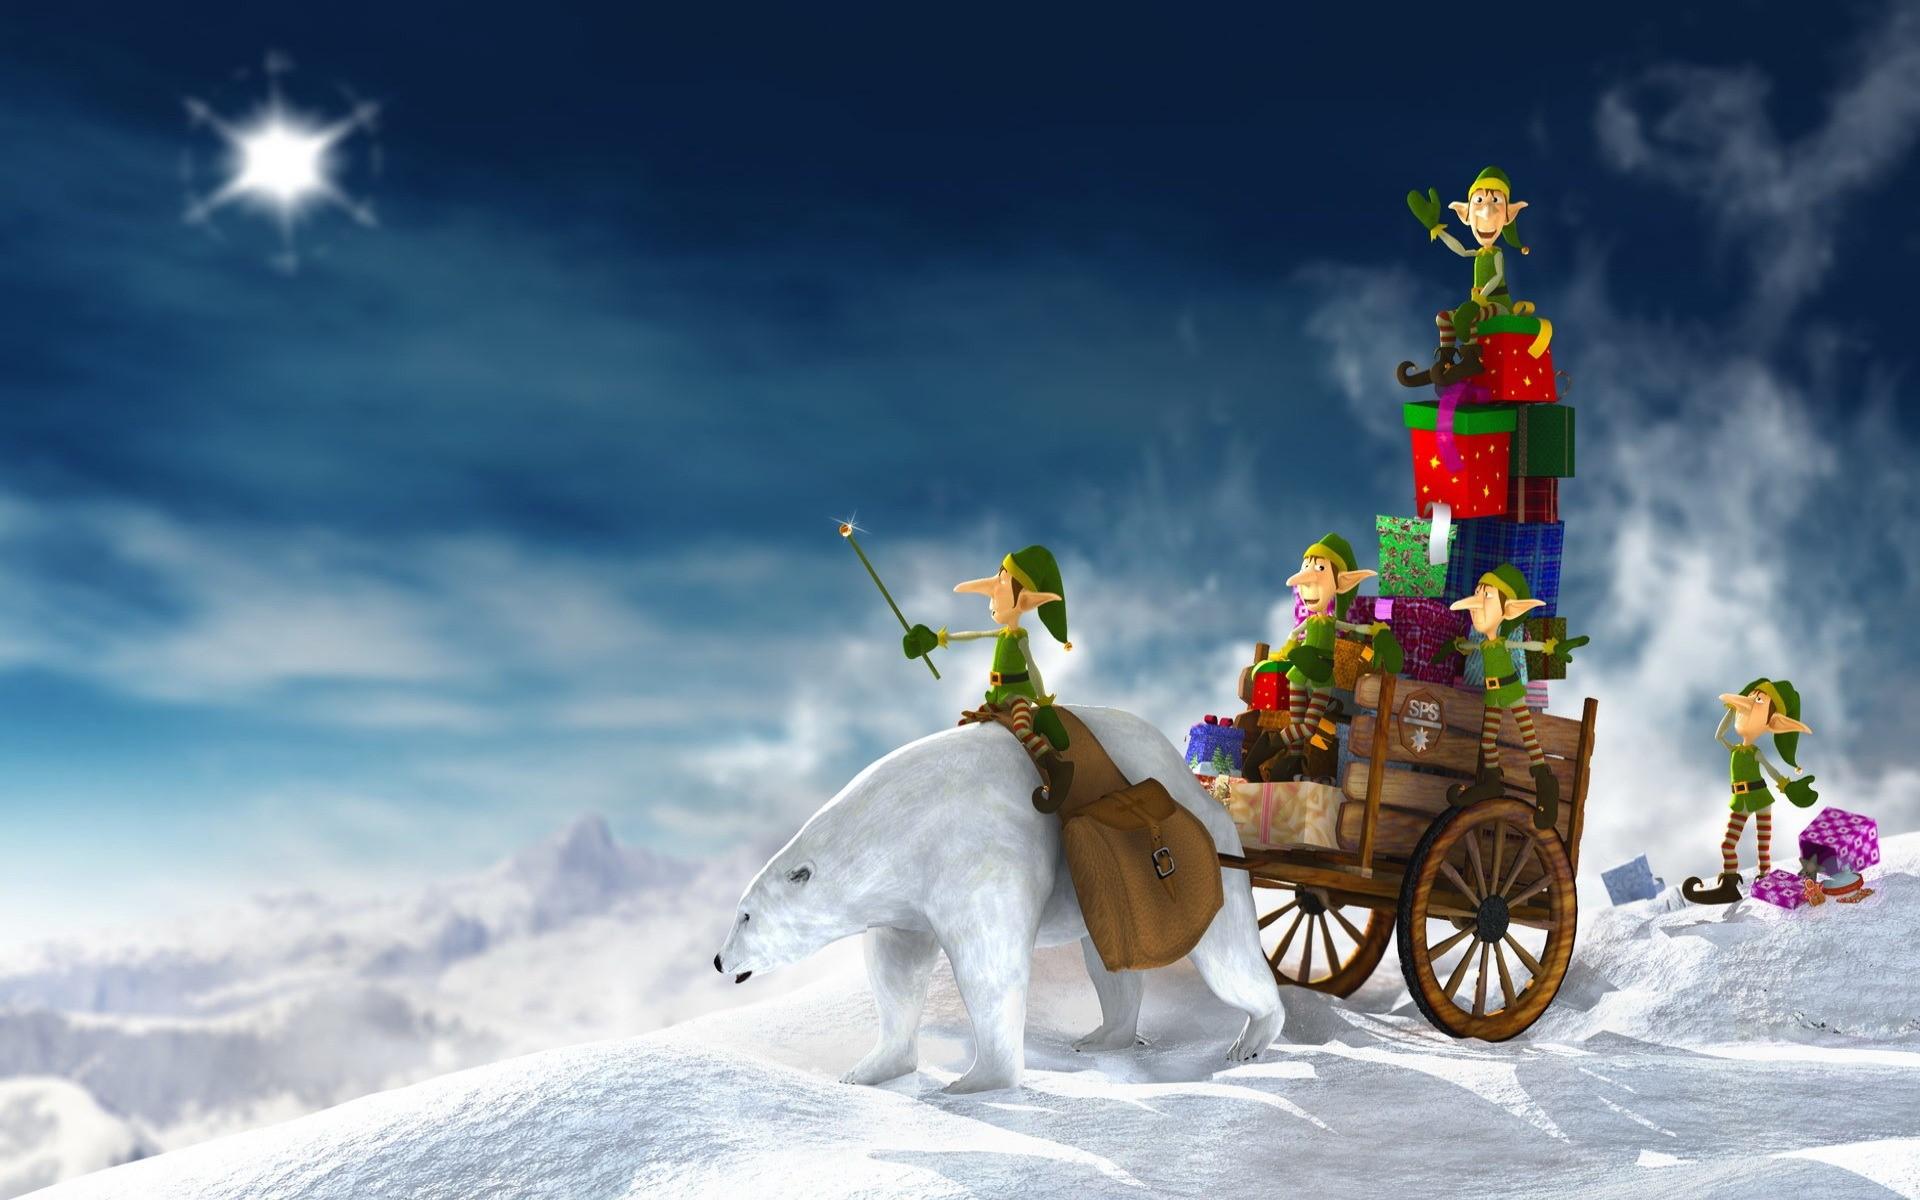 Wallpaper Elves delivering Christmas gifts